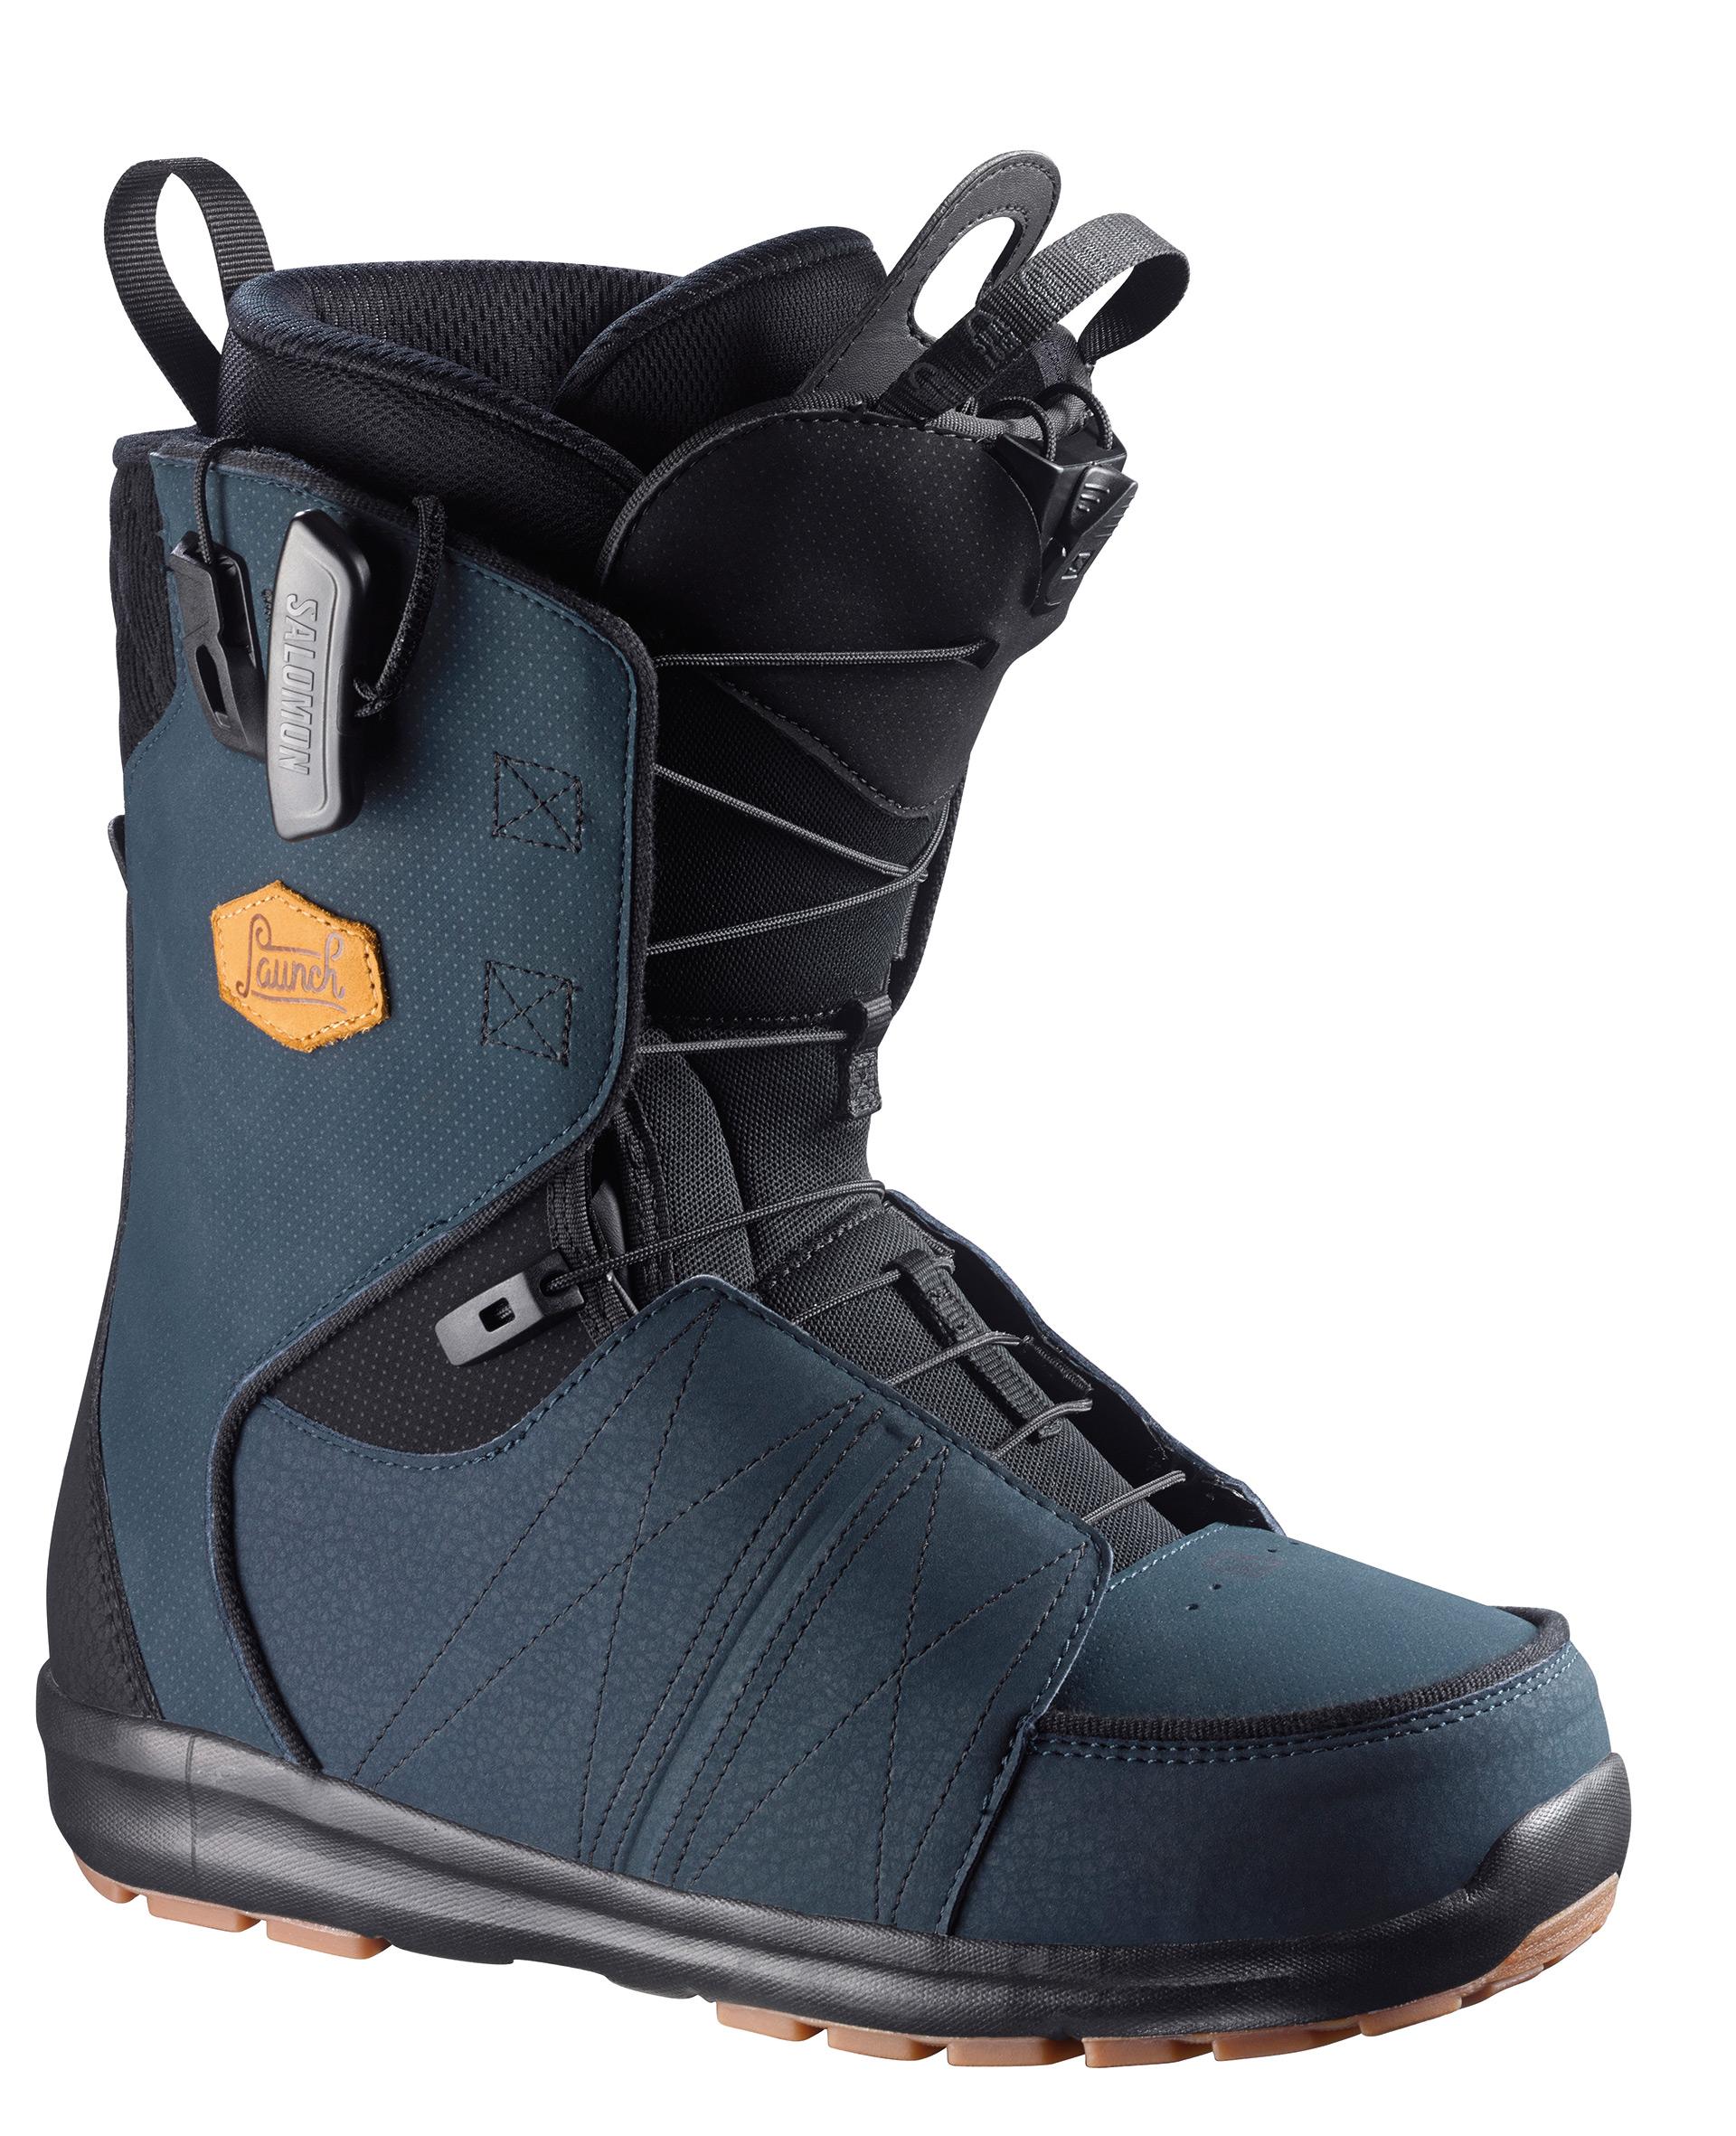 Launch Boot - Salomon